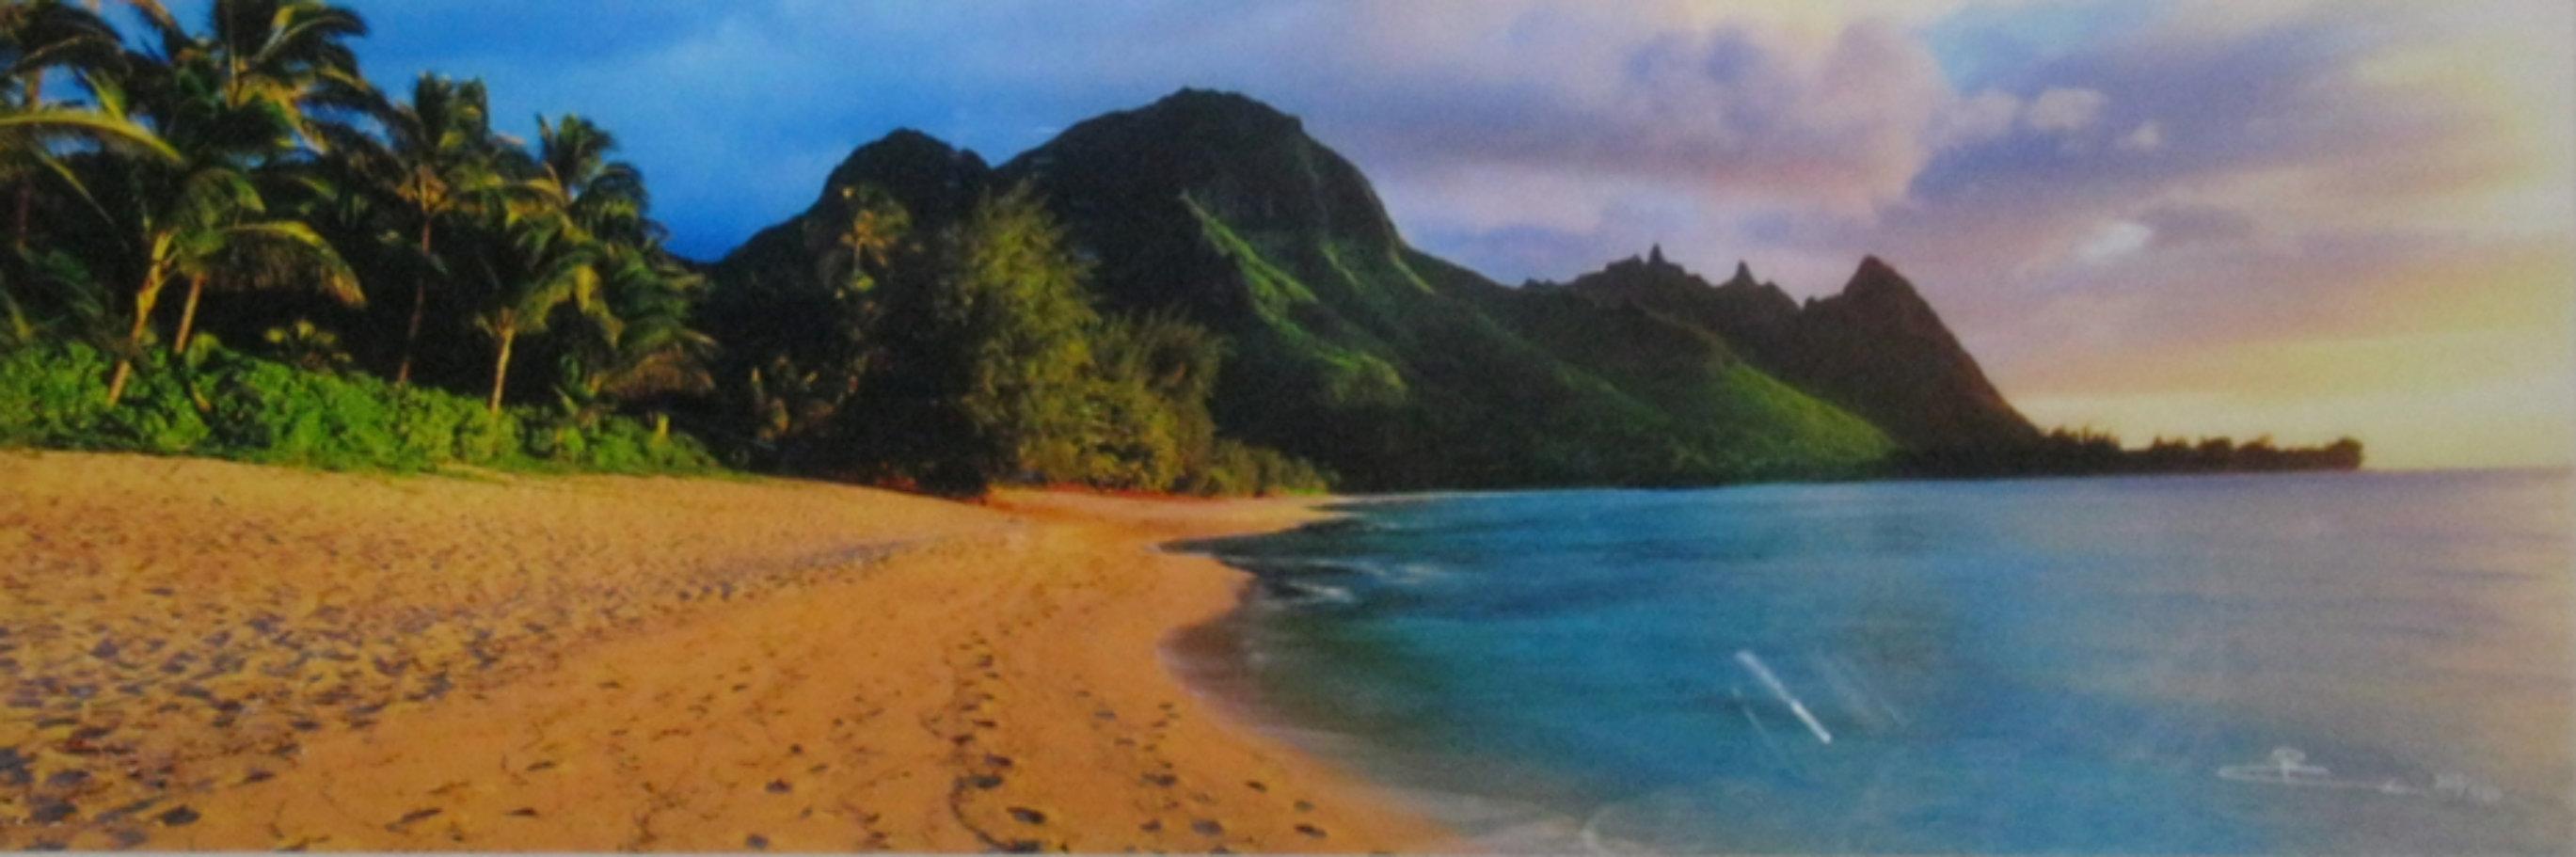 Seventh Heaven (Na Pali Coast, Kauai, Hawaii) Panorama by Peter Lik